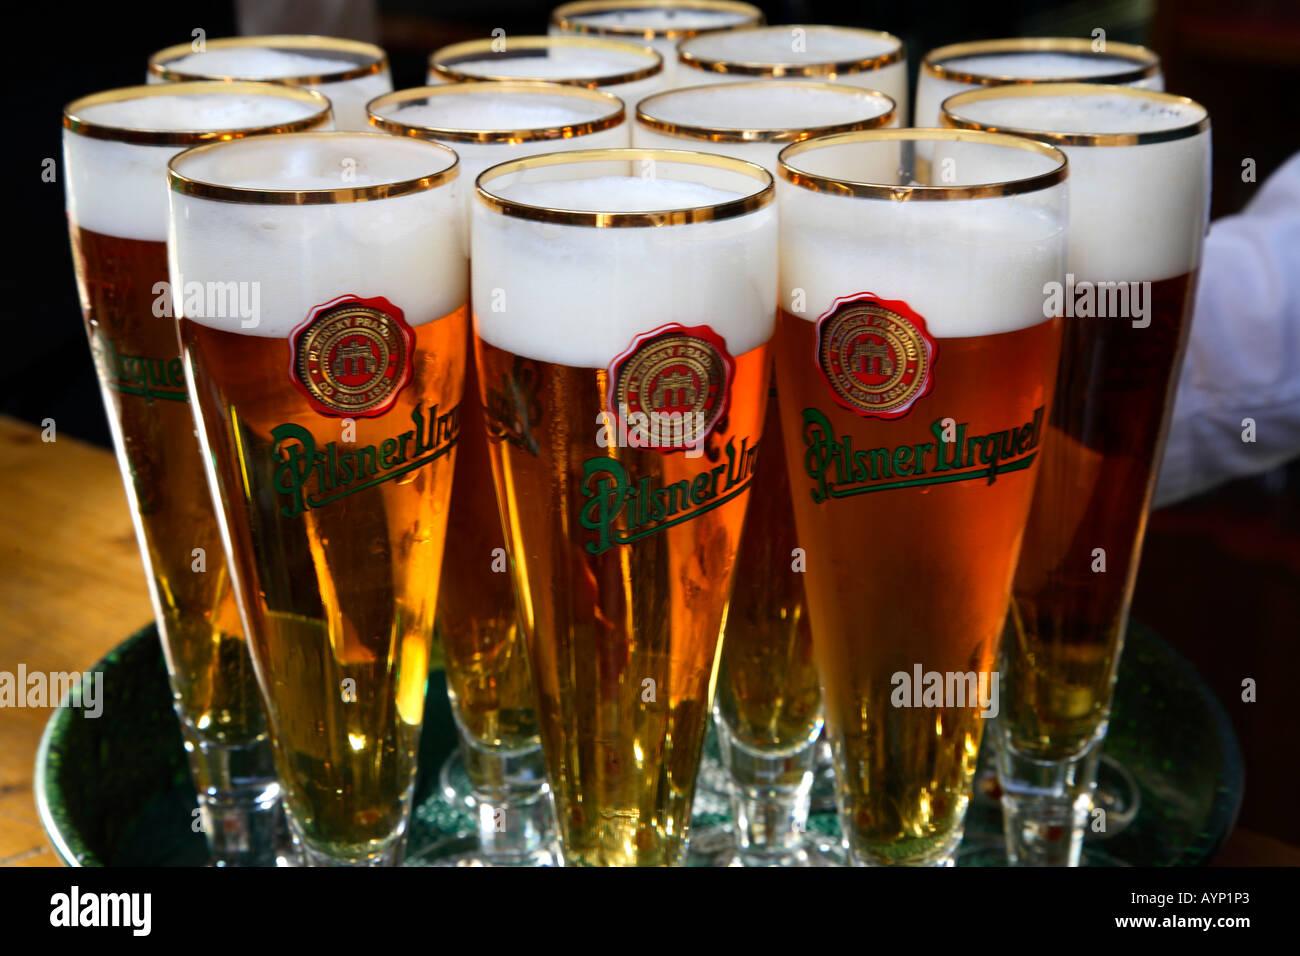 Prague czech beer Pilsner Urquell beer glasses waiter plate Stock